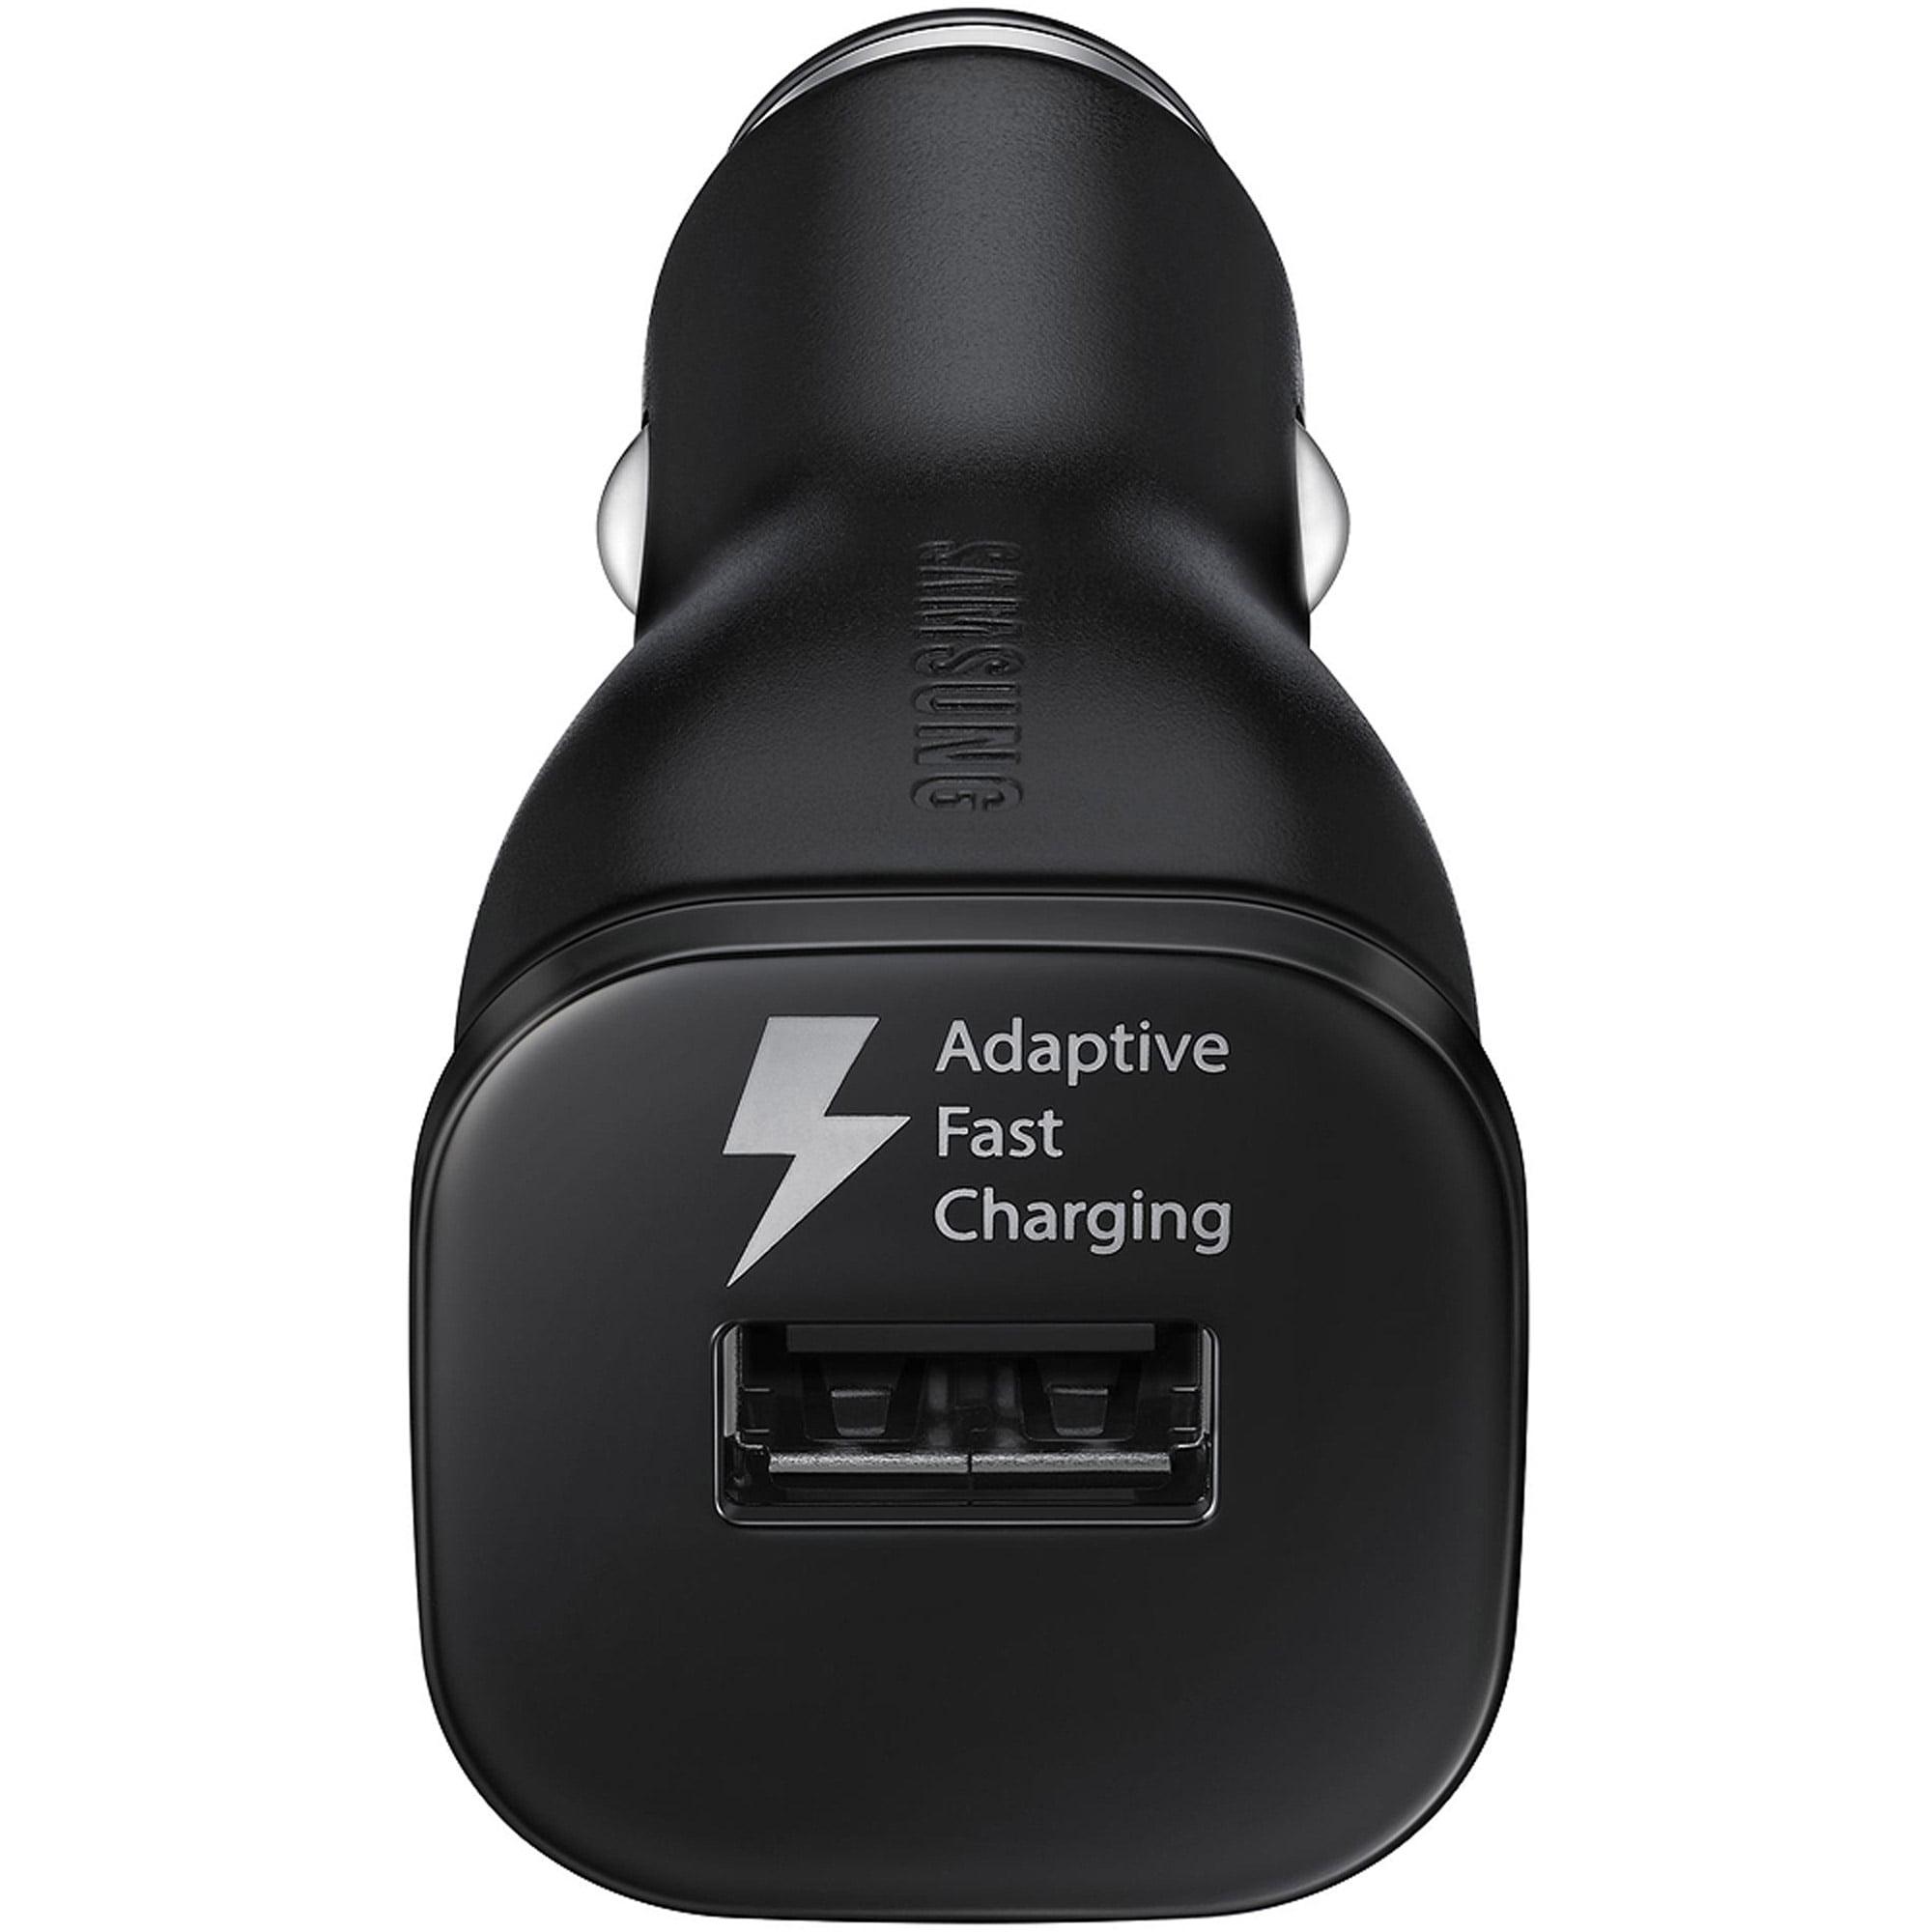 Resultado de imagen para samsung adaptive fast charging vehicle charger